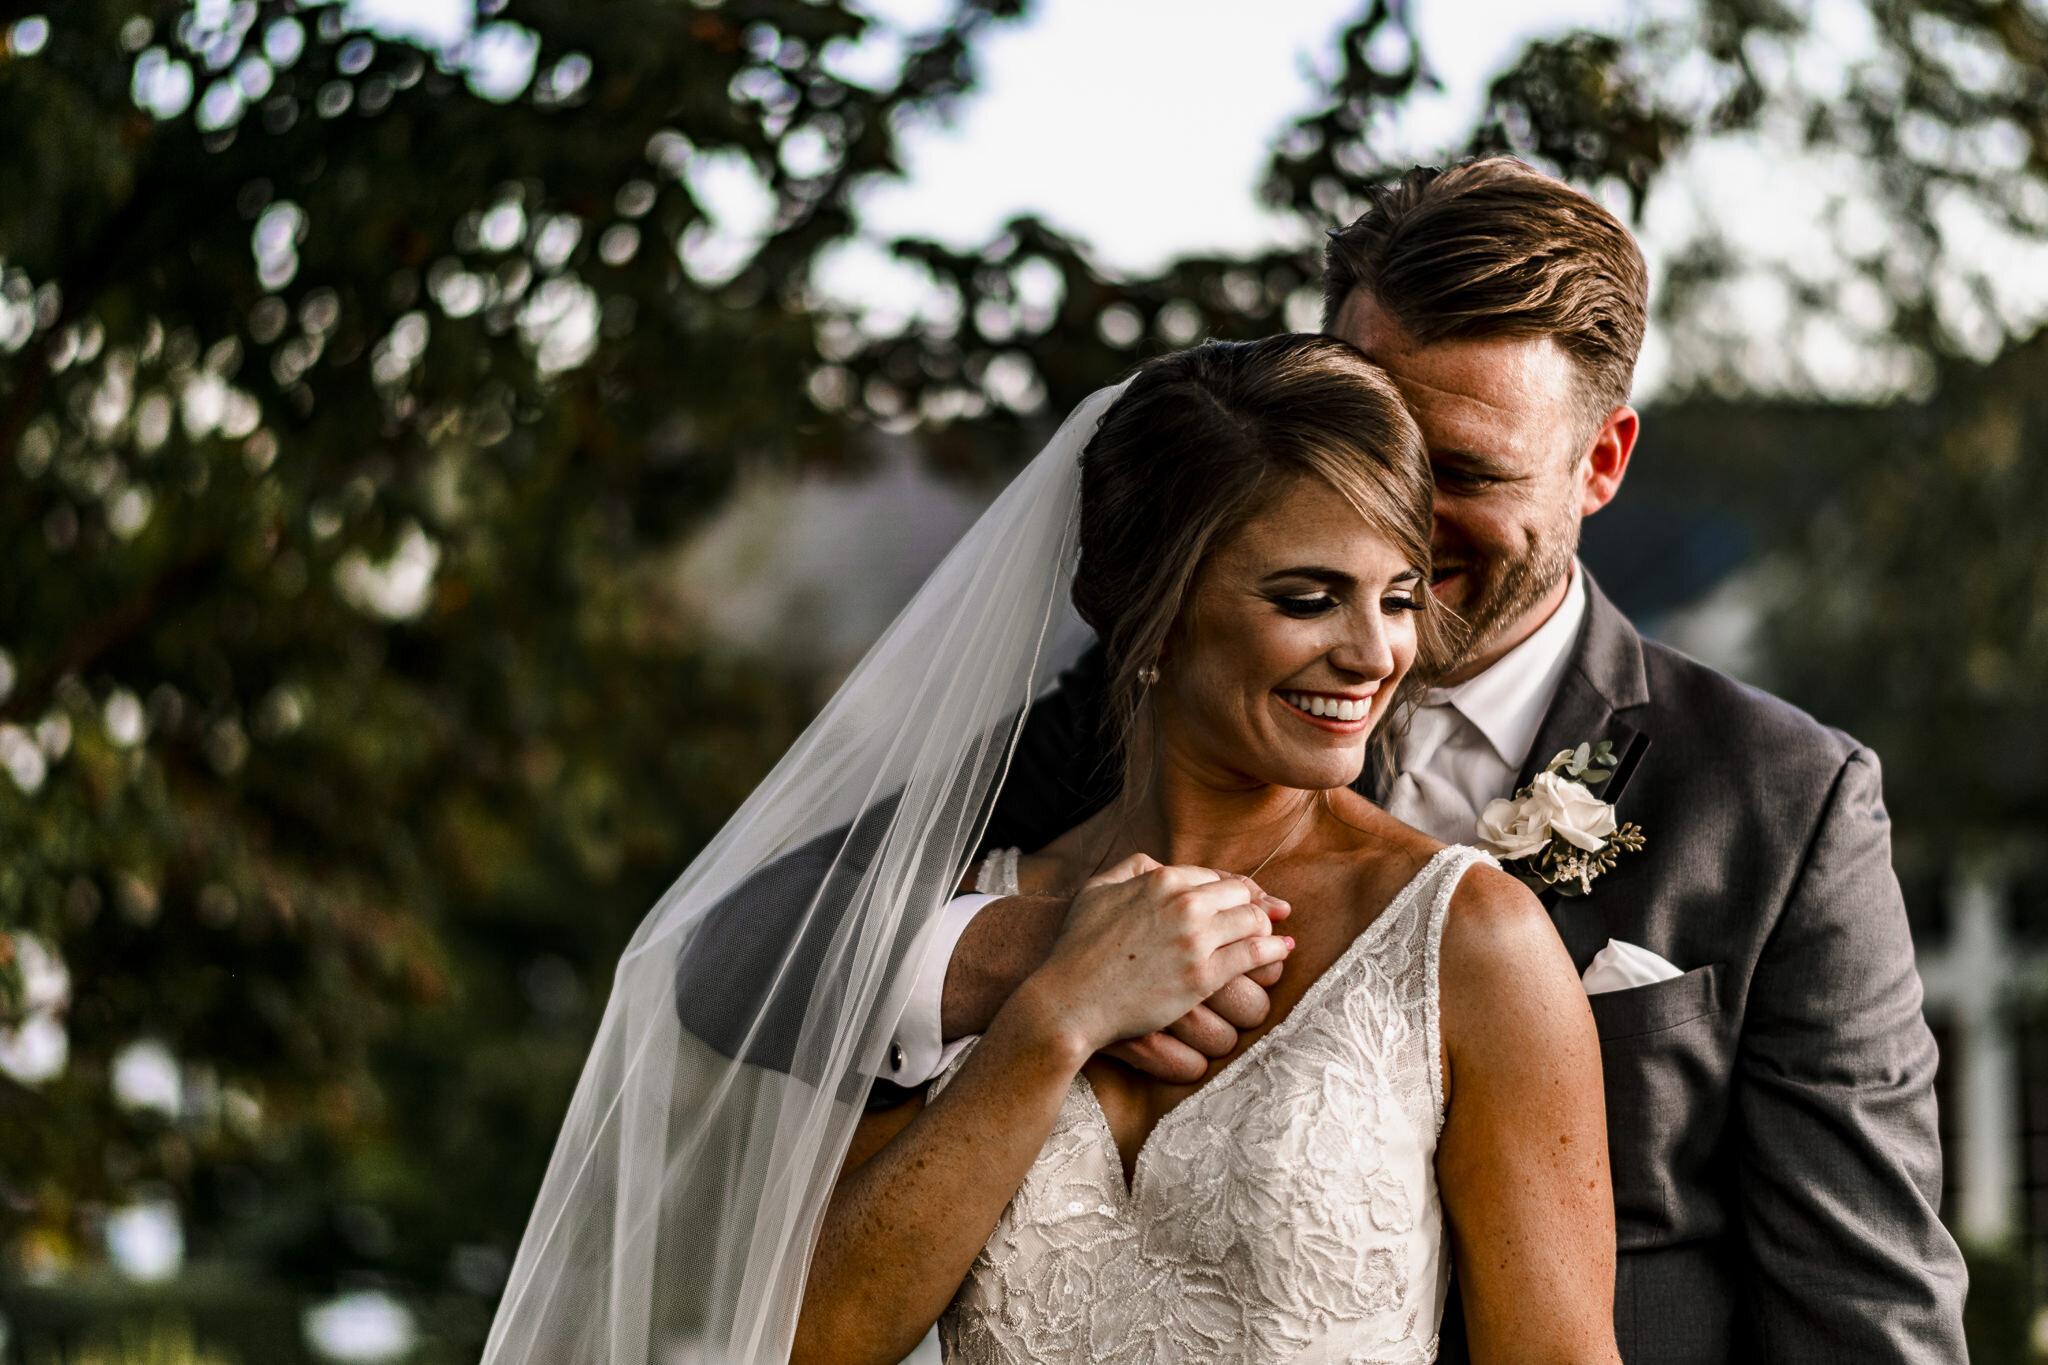 Coyle-Forsgate-Country-Club-Wedding-Photographer-33.JPG